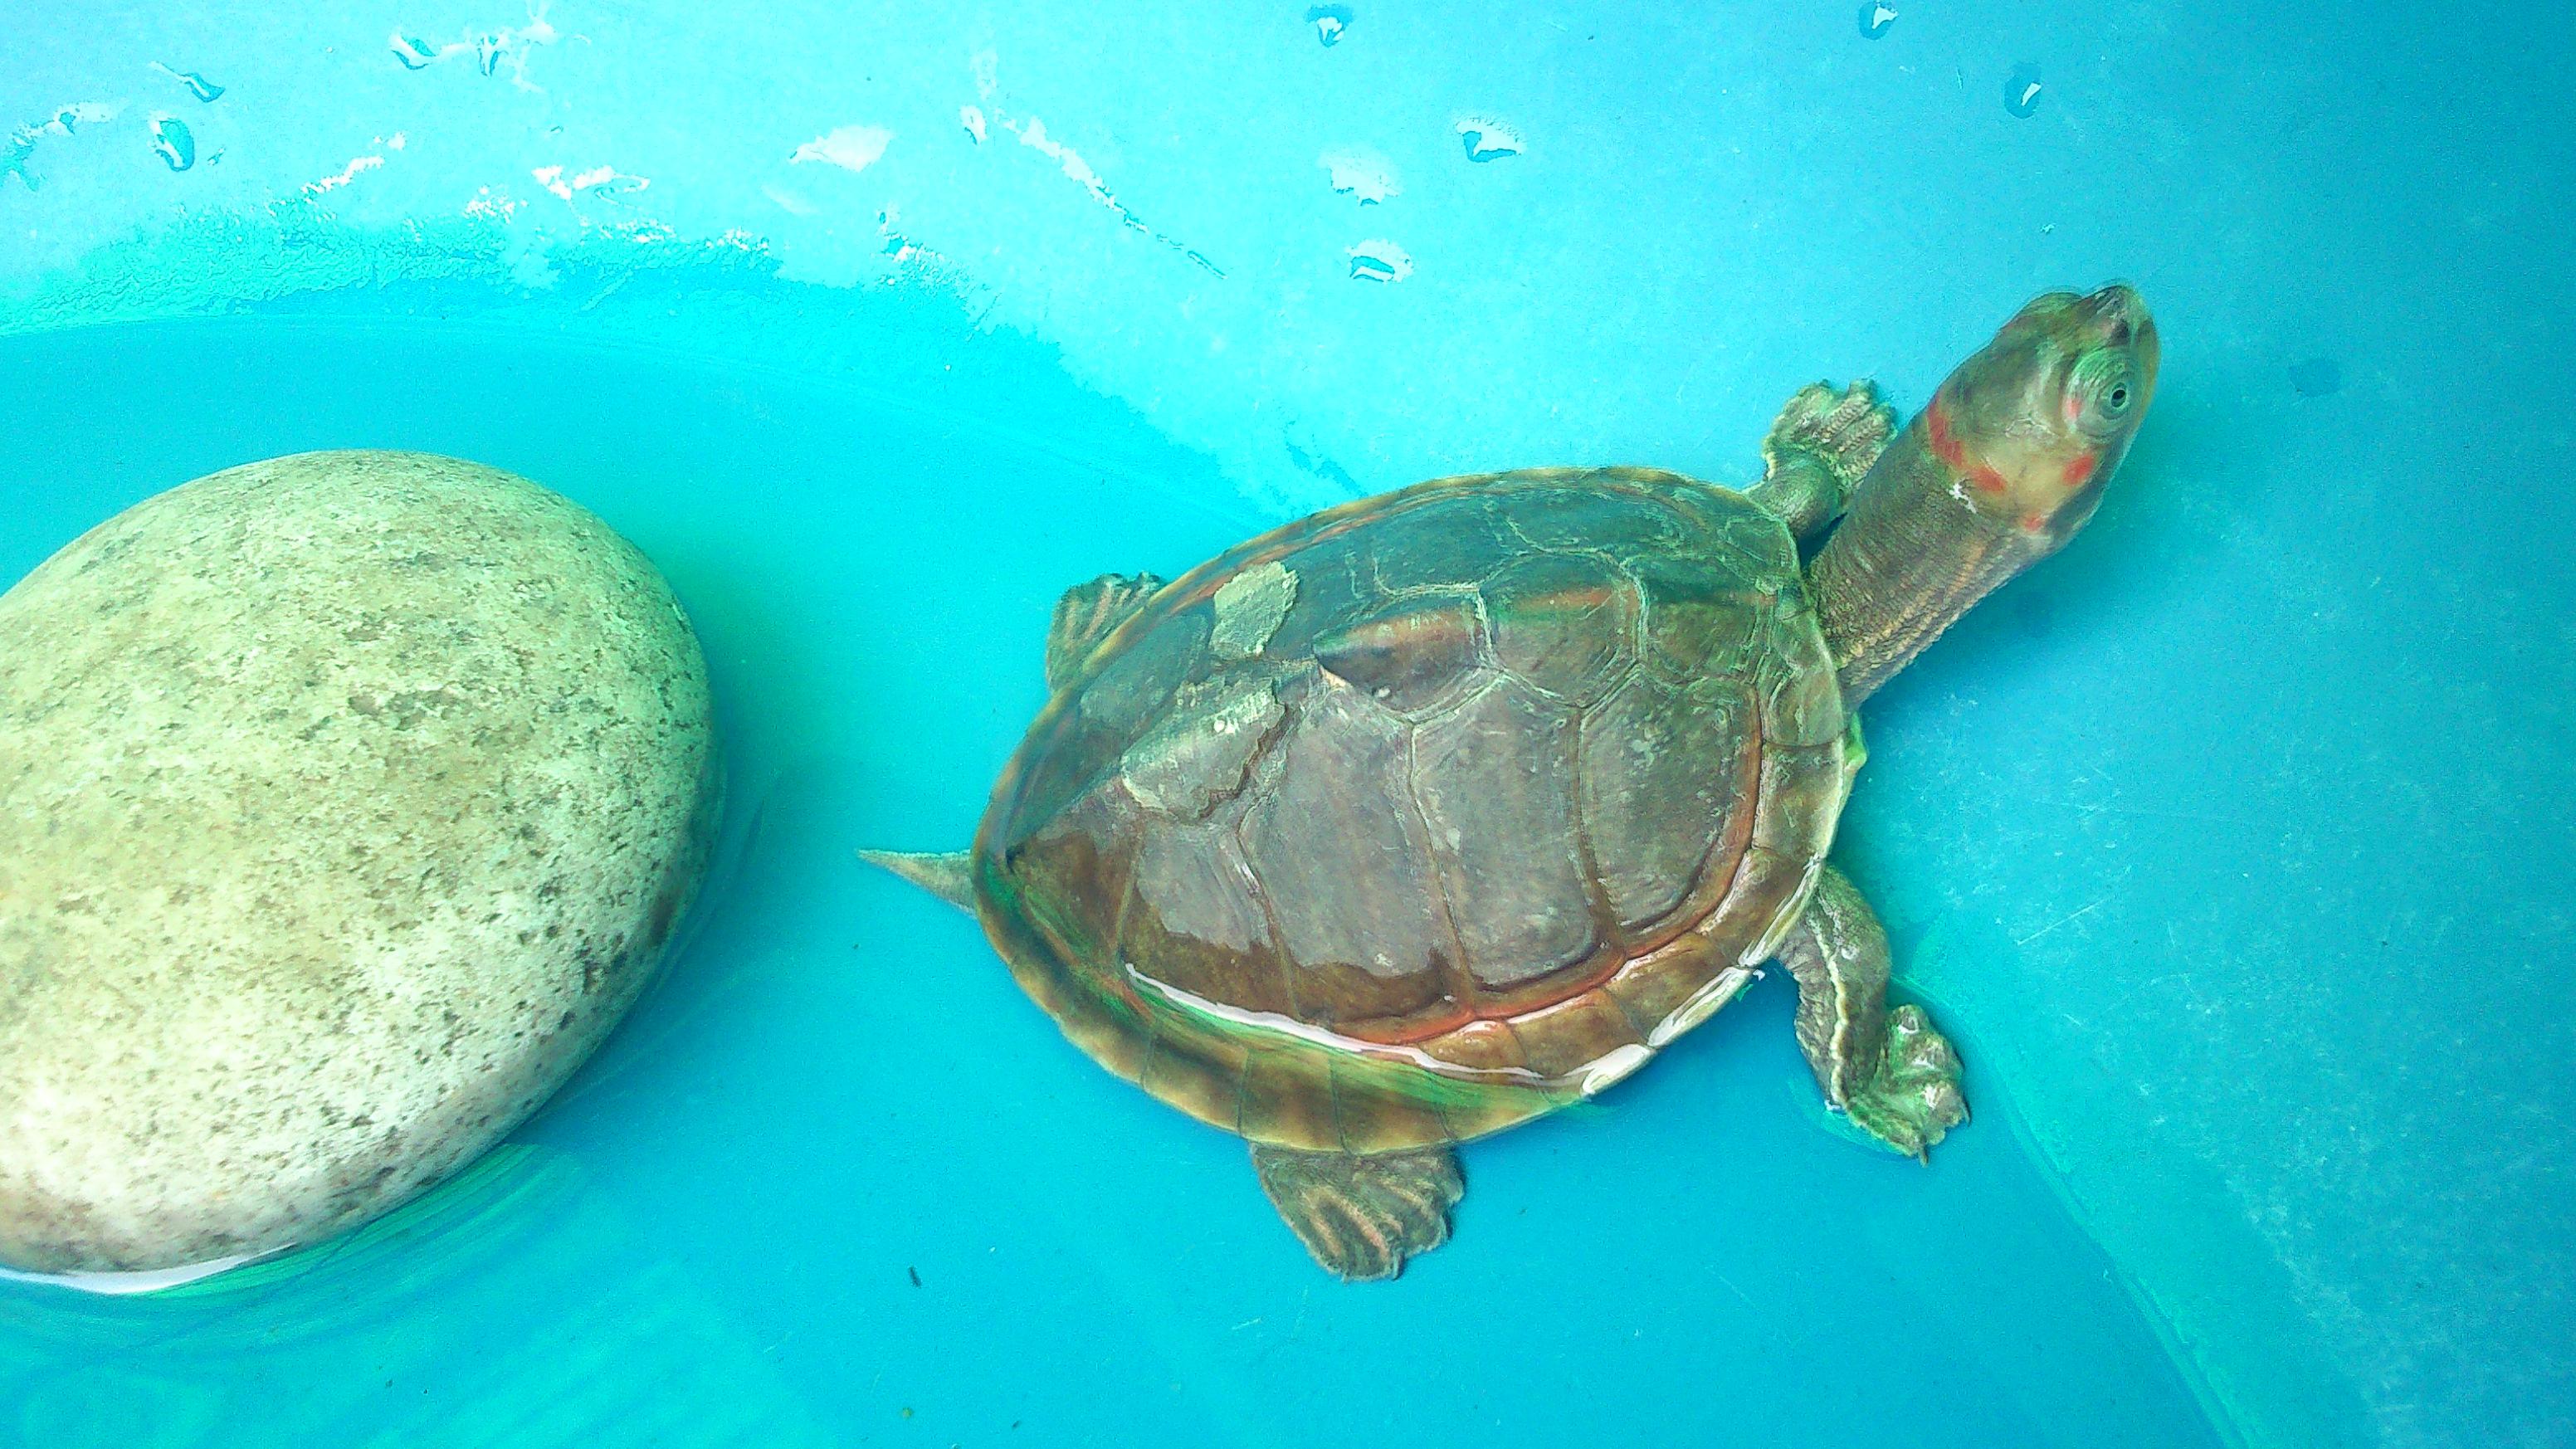 Indian Tent Turtle (Pangshura tentoria) - All Turtles